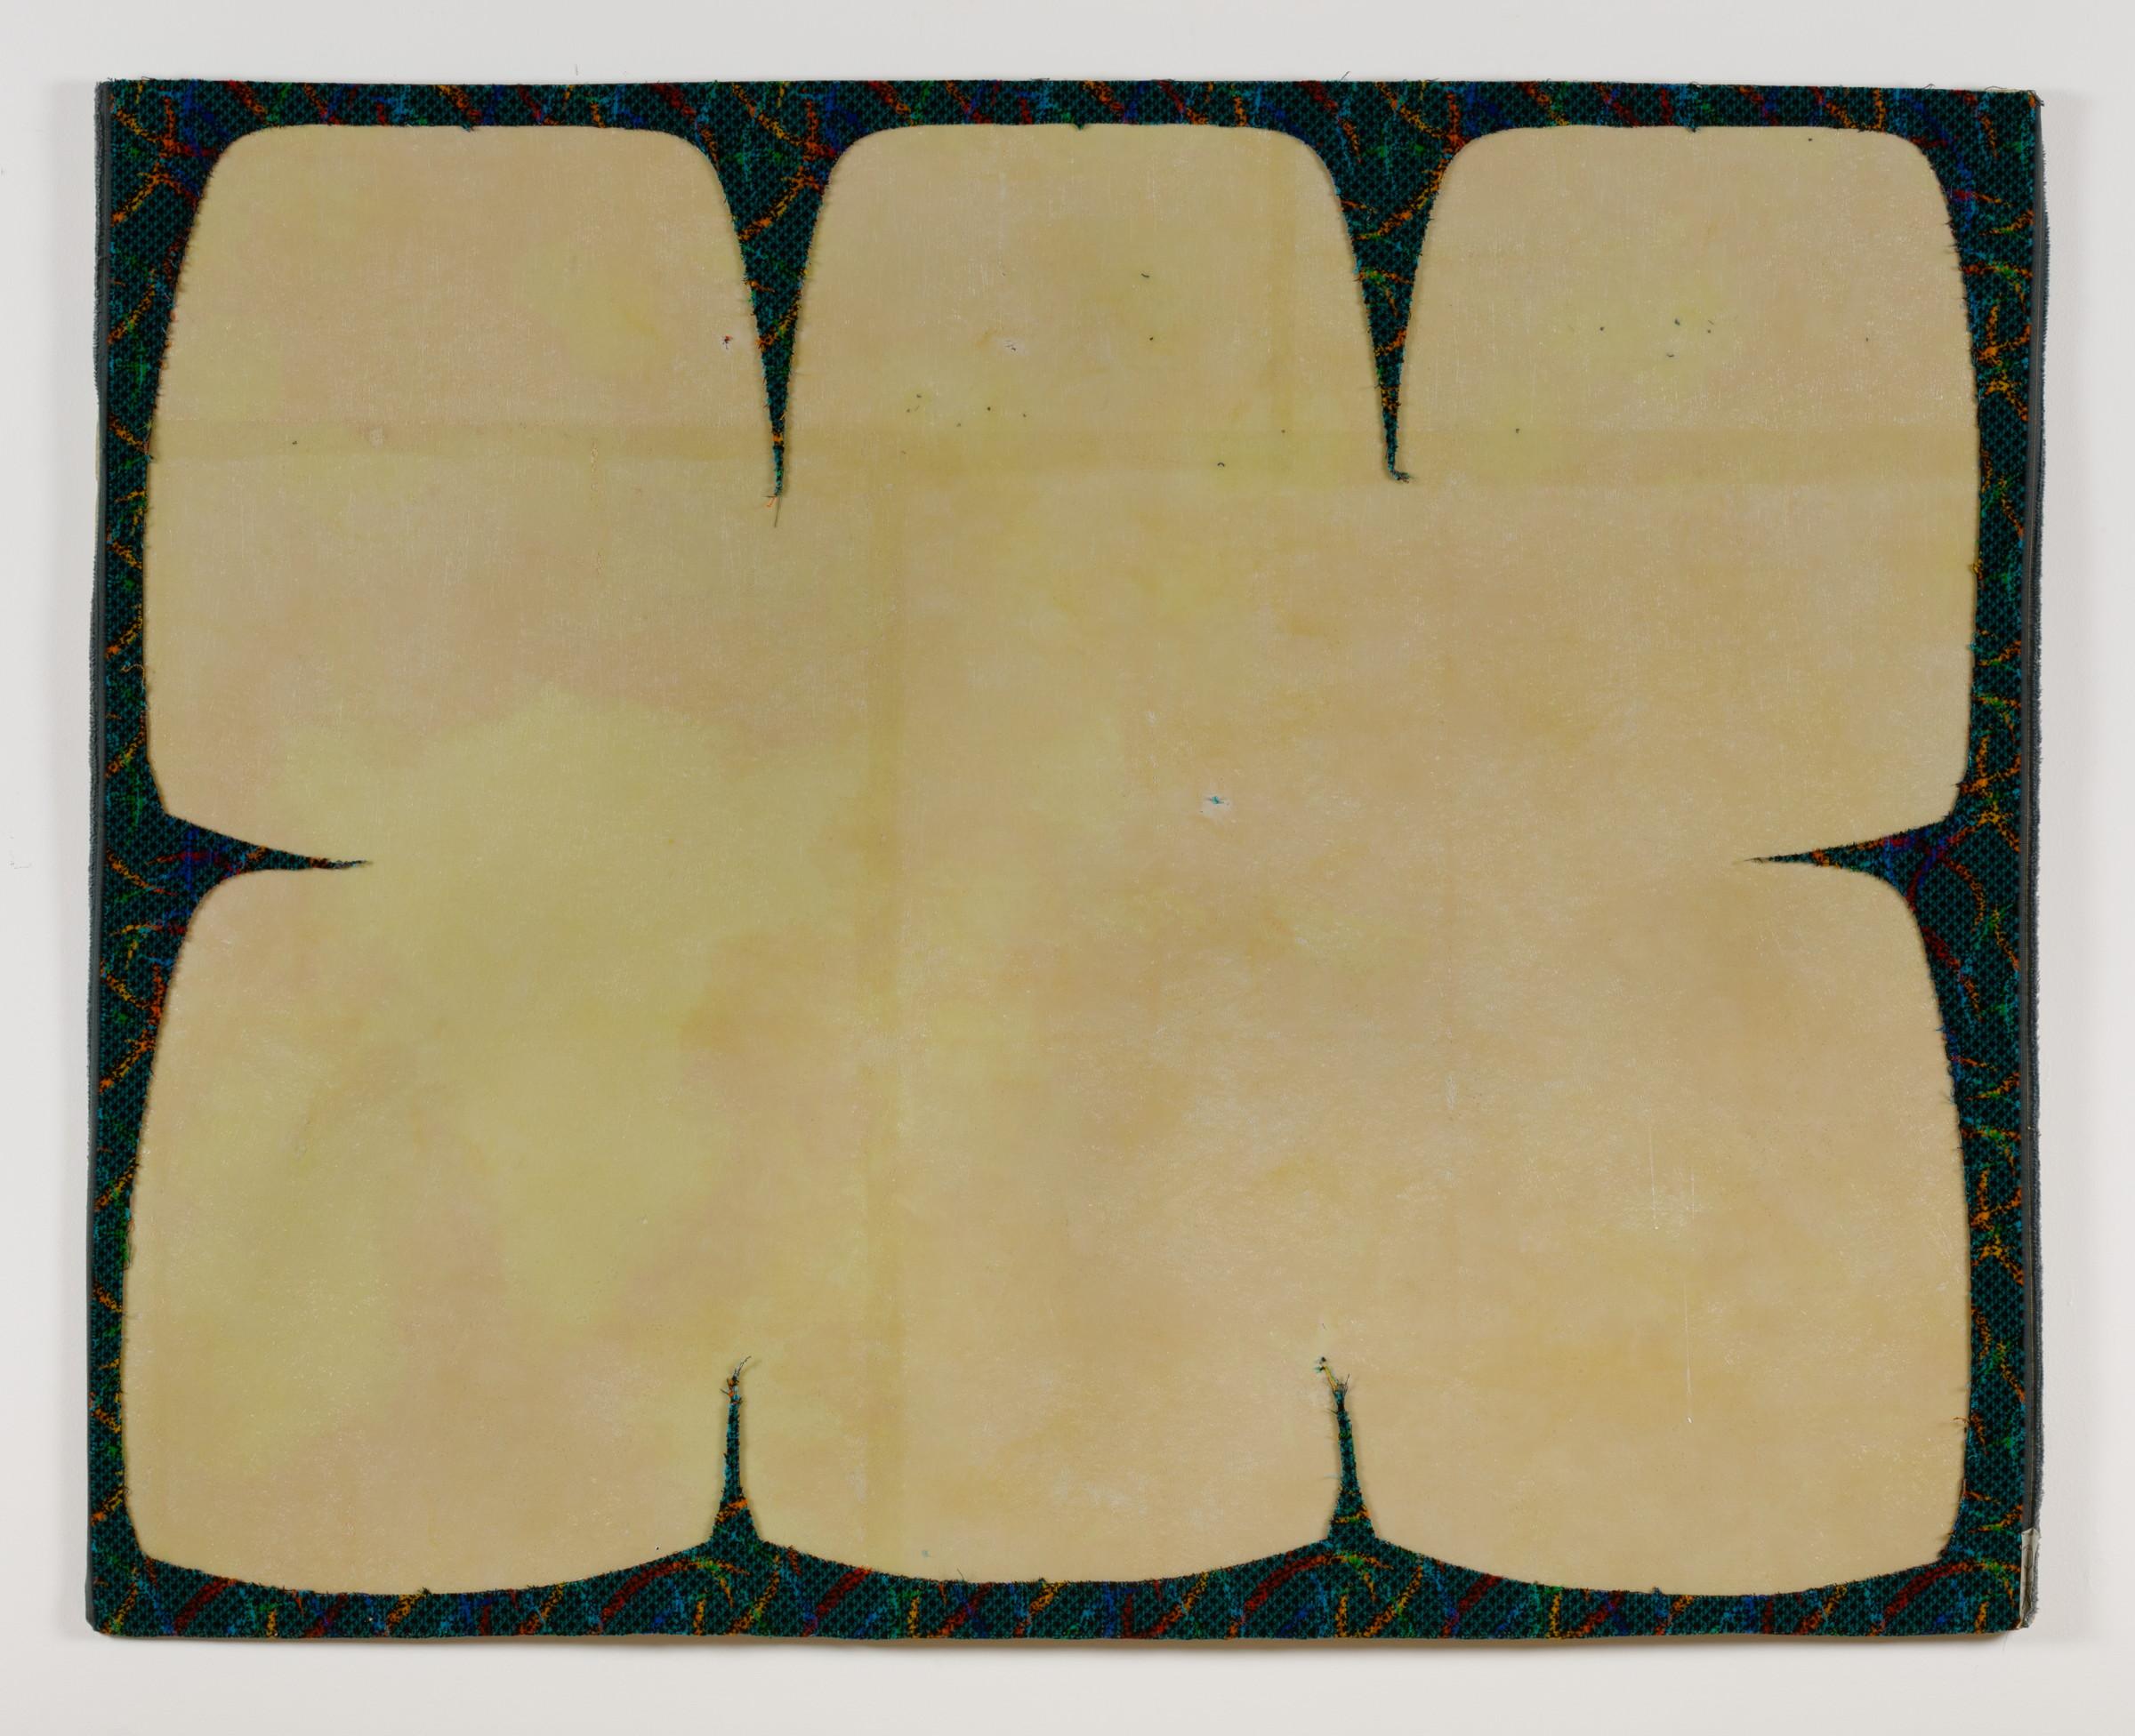 Jessica Vaughn,  Arcs Blue,  2016, upholstery scrap on fiberglass panel, 52 x 50 x ¼ in.